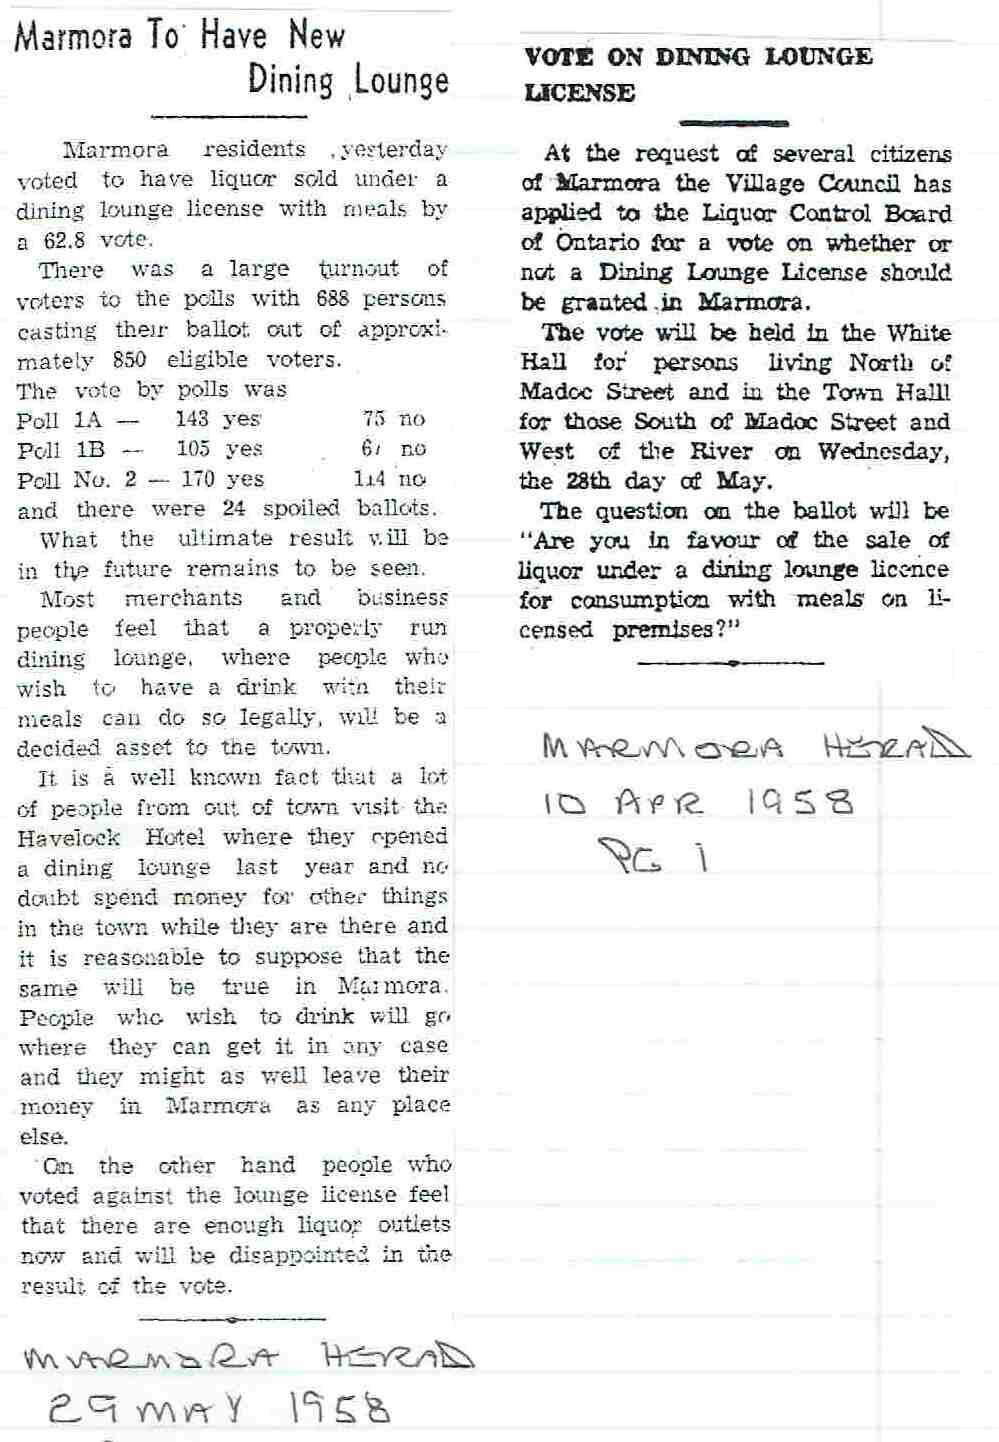 1958 Vote on licenced Dining lounge.JPG